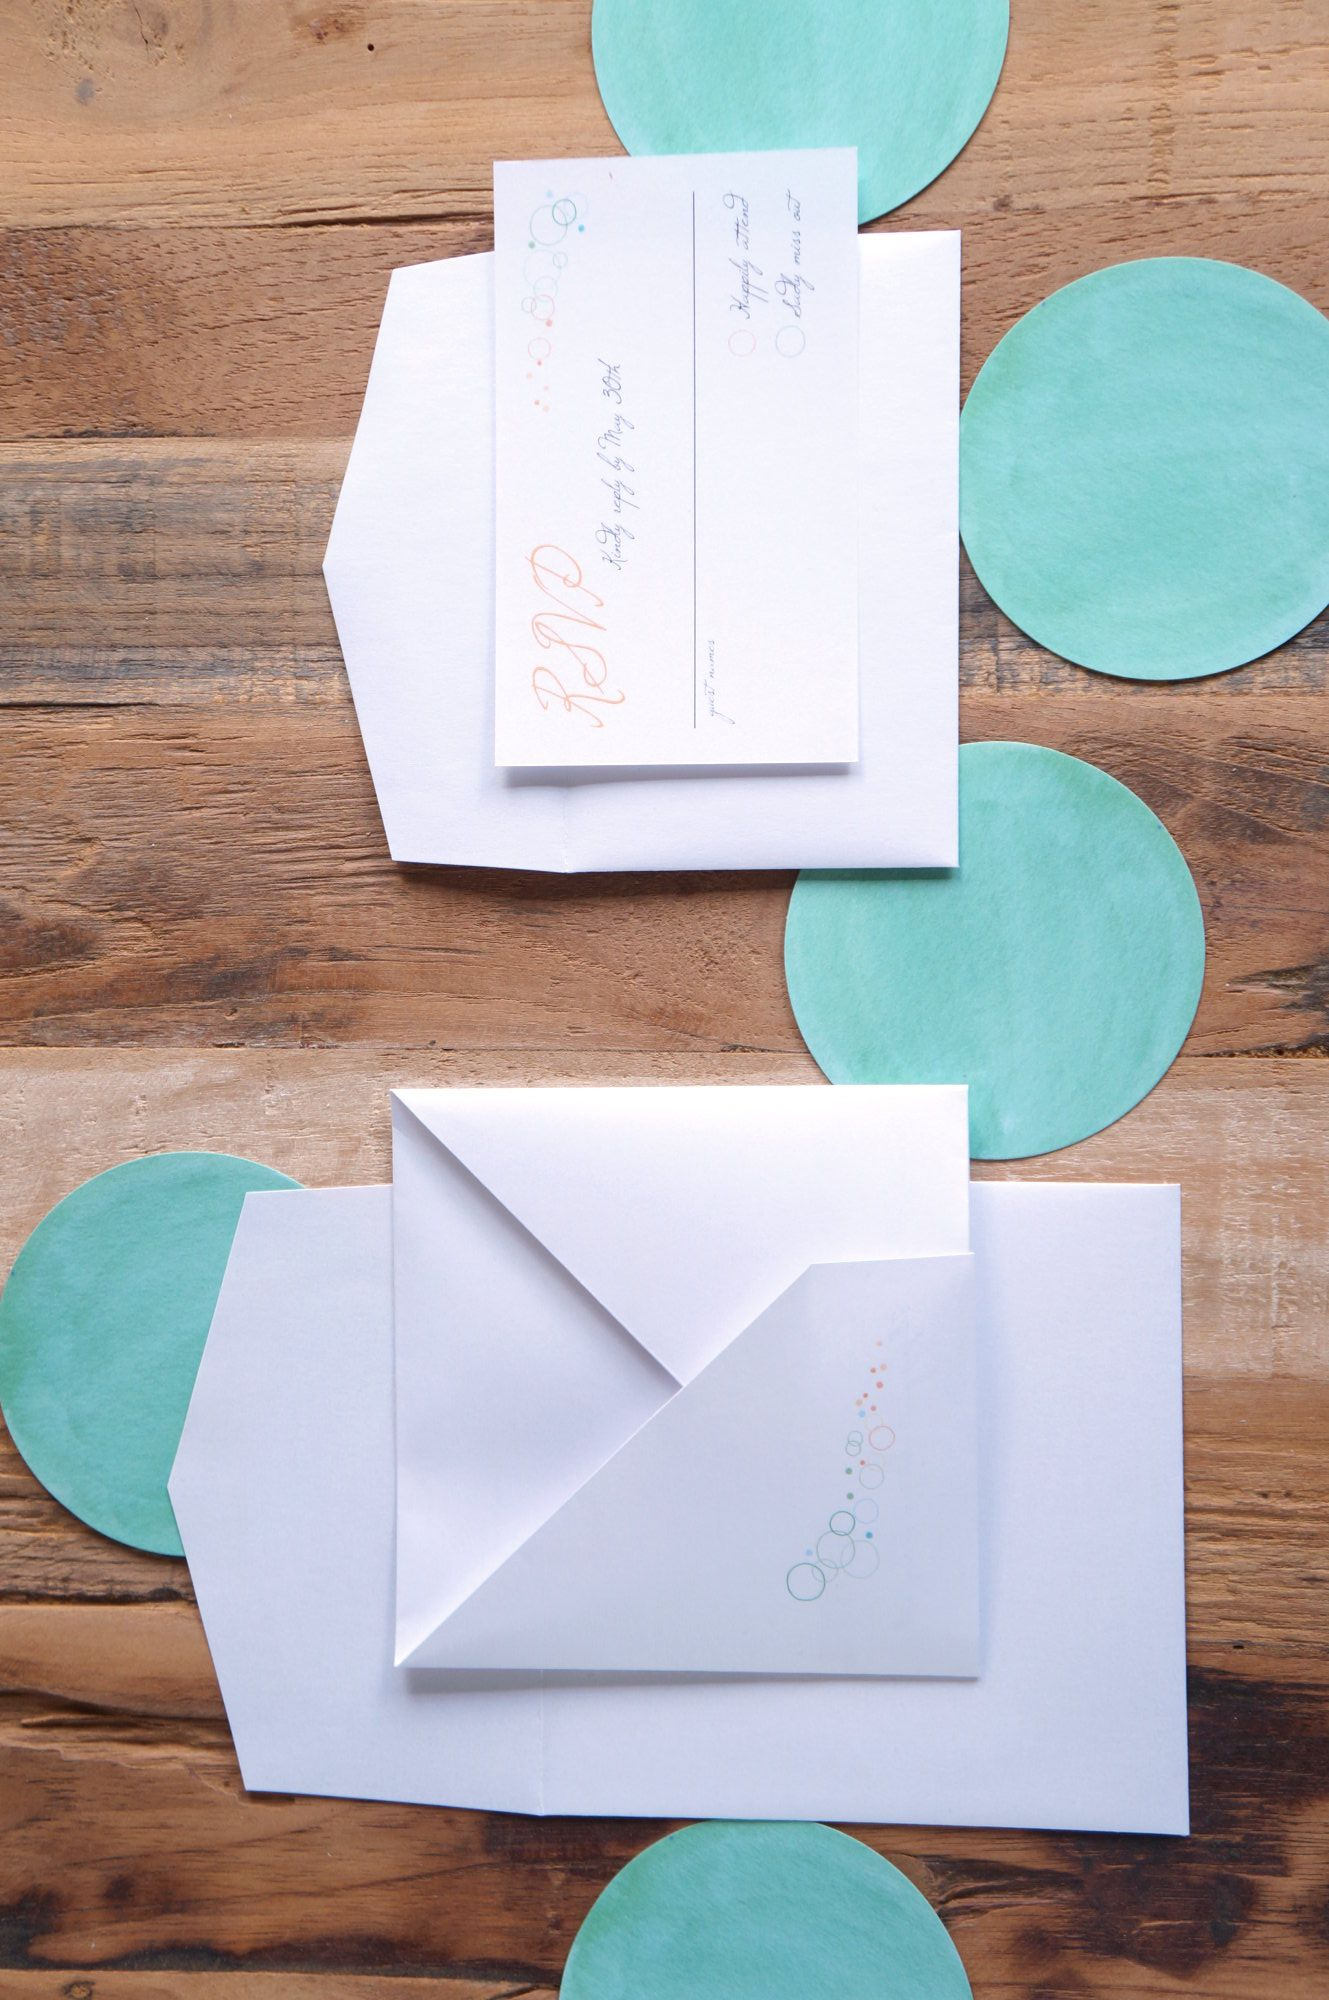 Hanabi - origami-inspired wedding invitation by A Tactile Perception.